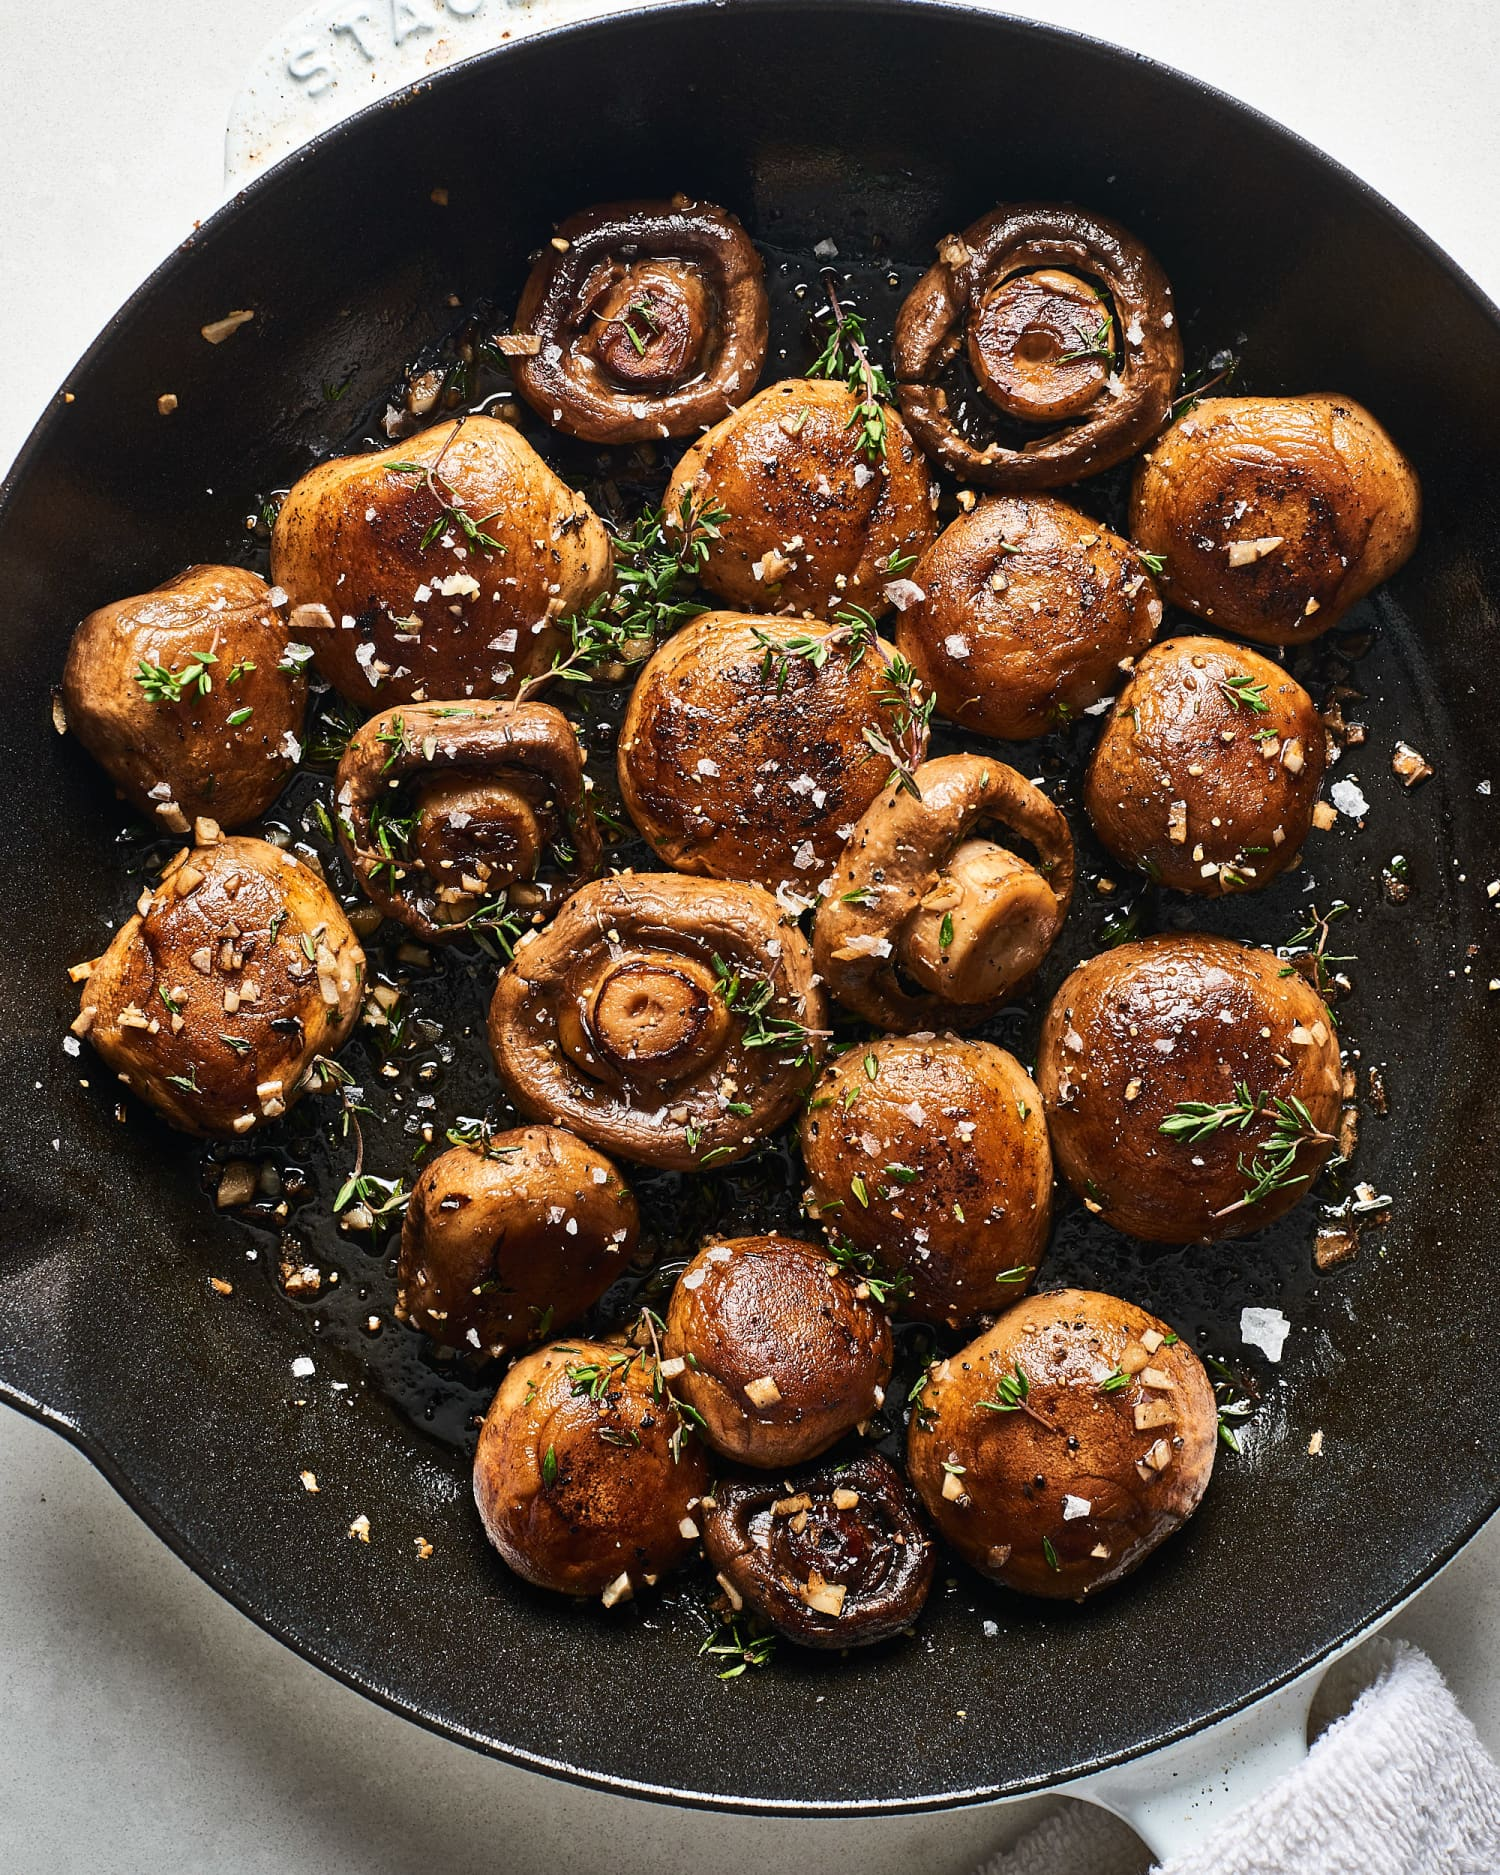 11 Popular Mushroom Recipes to Make Right Now